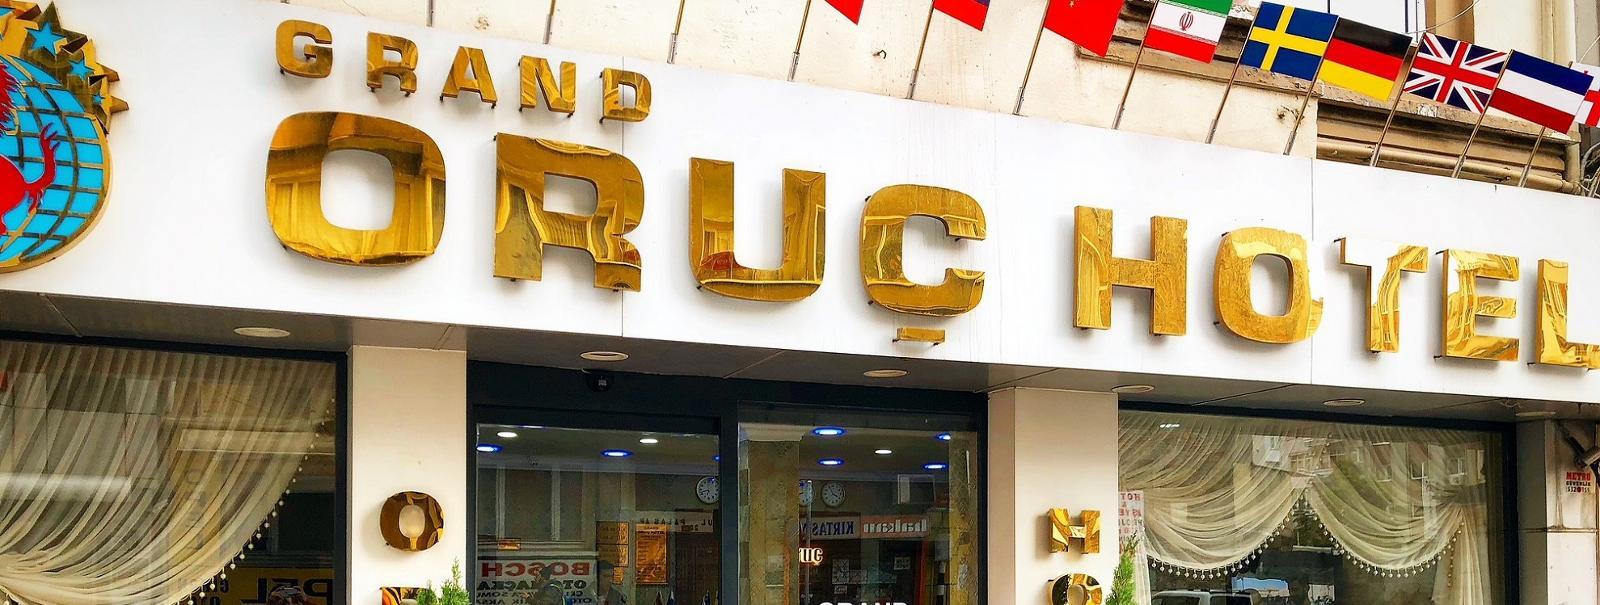 هتل گرند اوروج استانبول